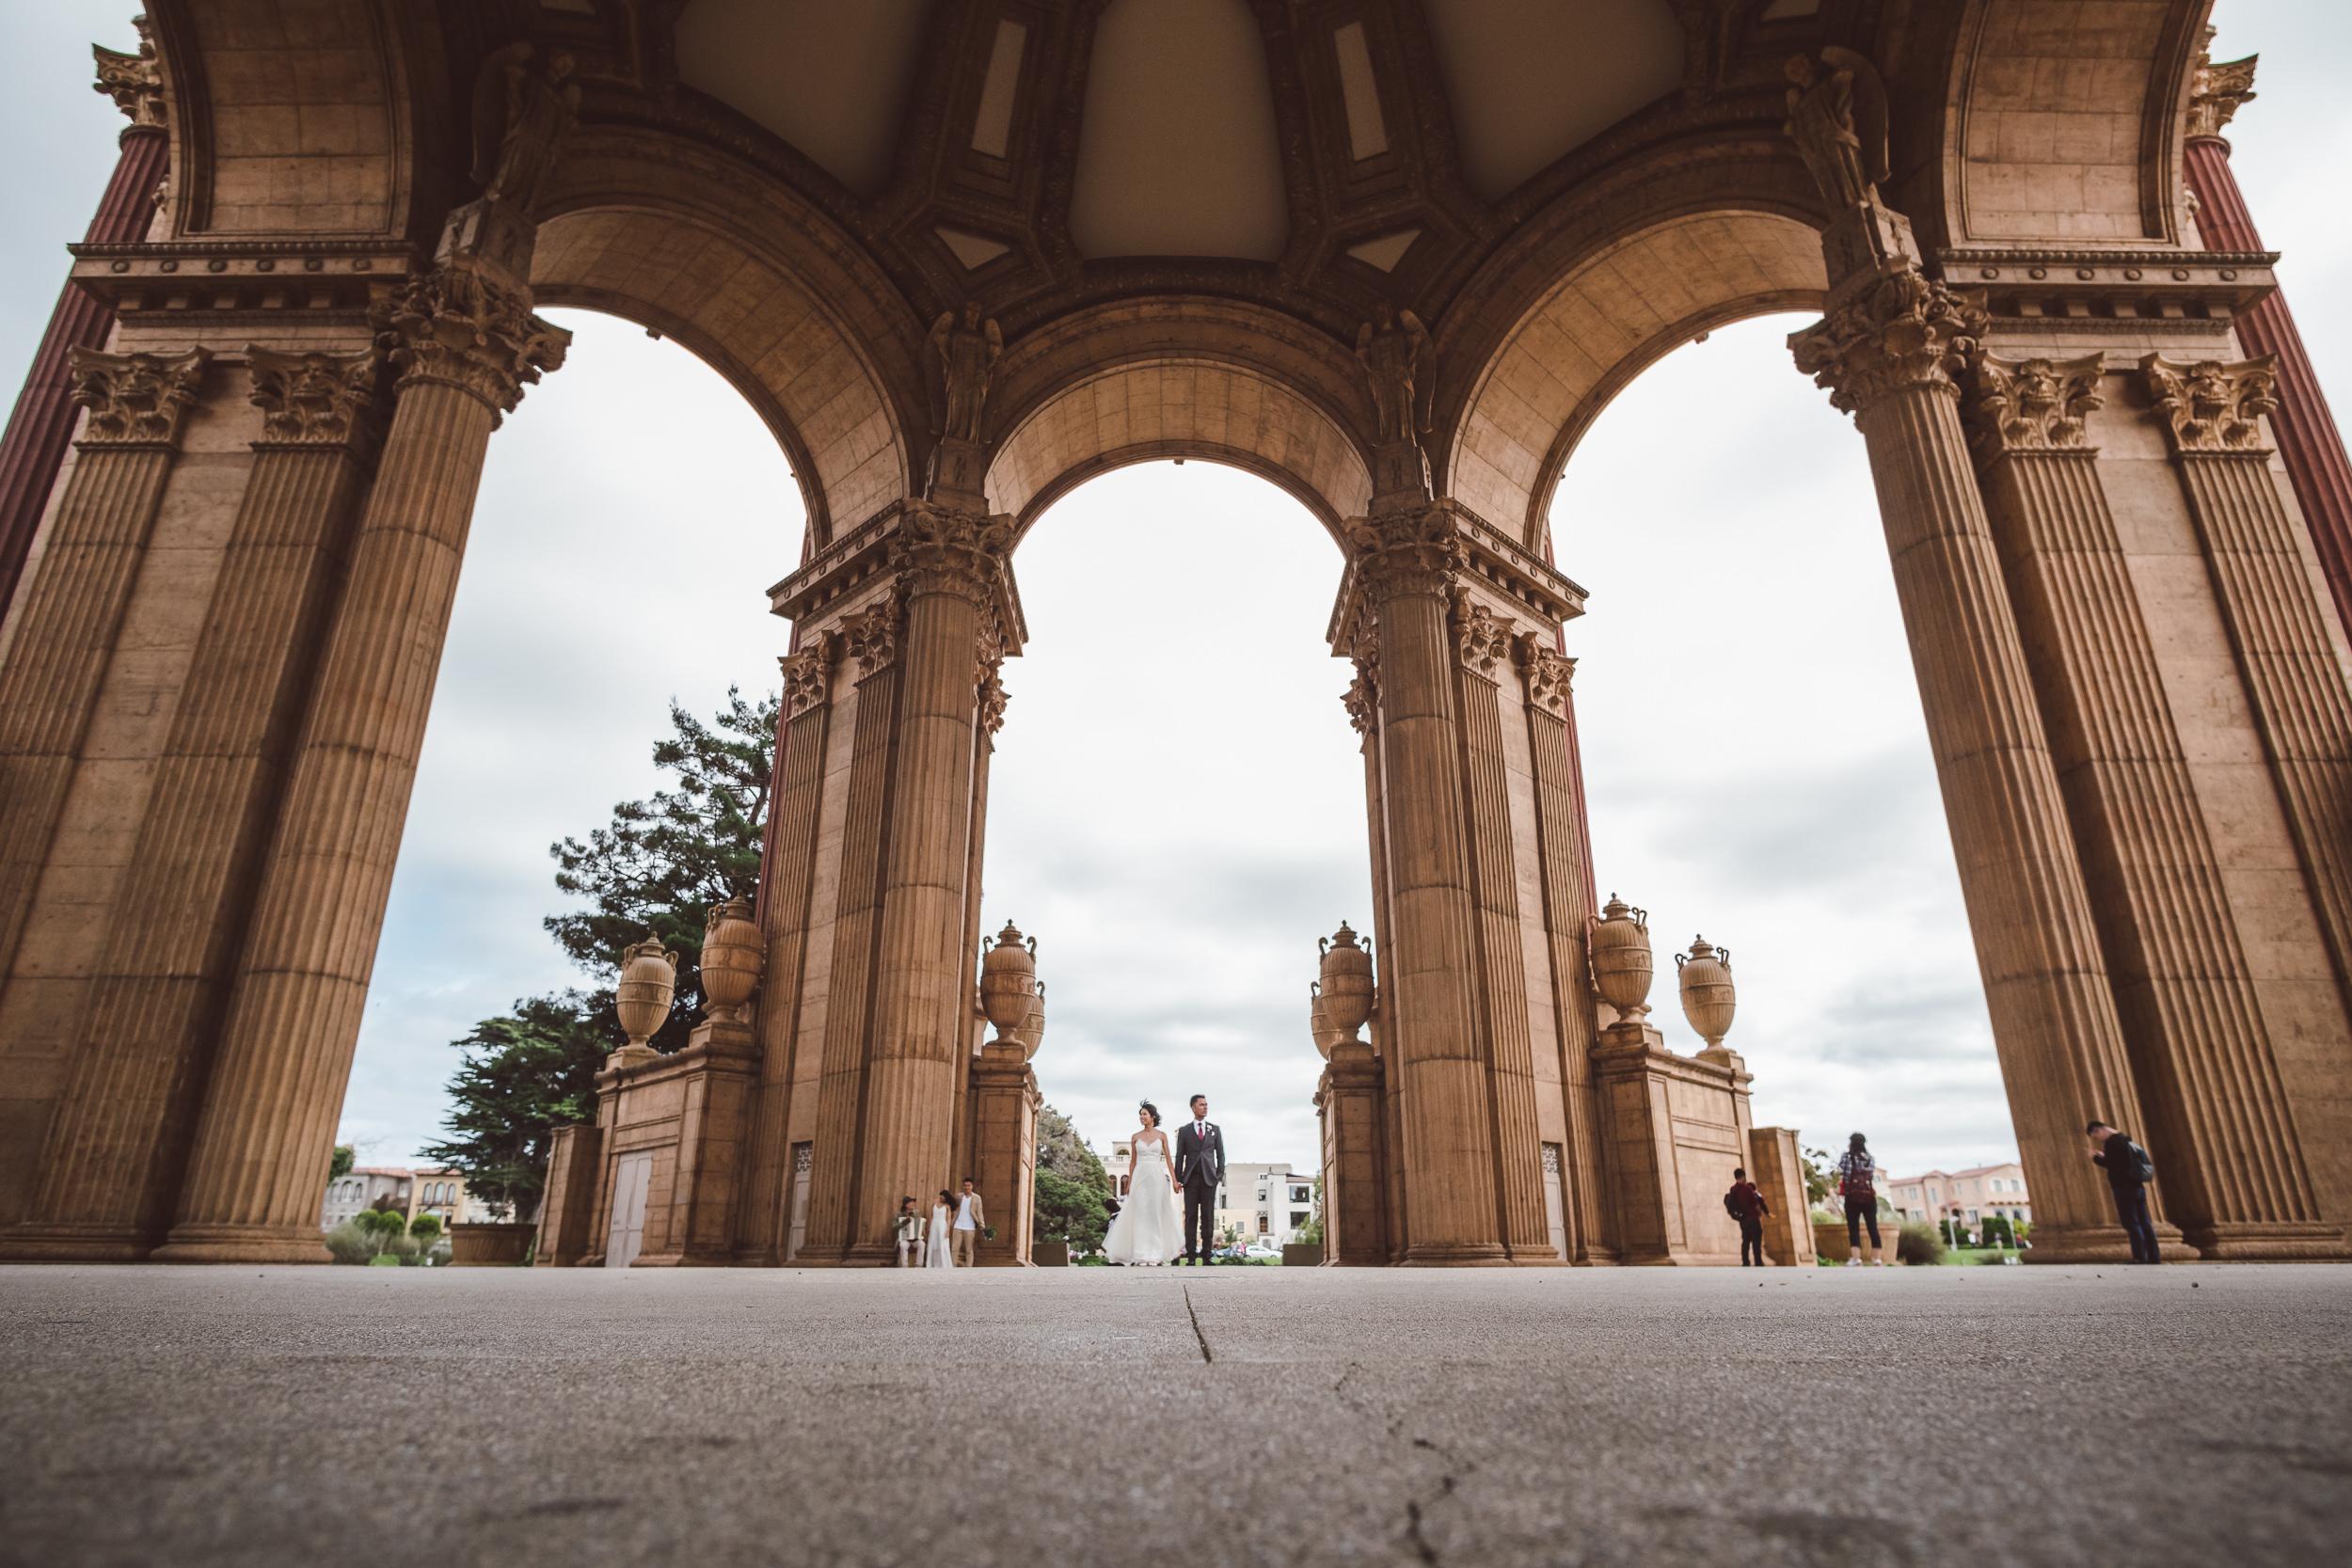 San-Francisco-City-Hall-Wedding-Photography-074.jpg